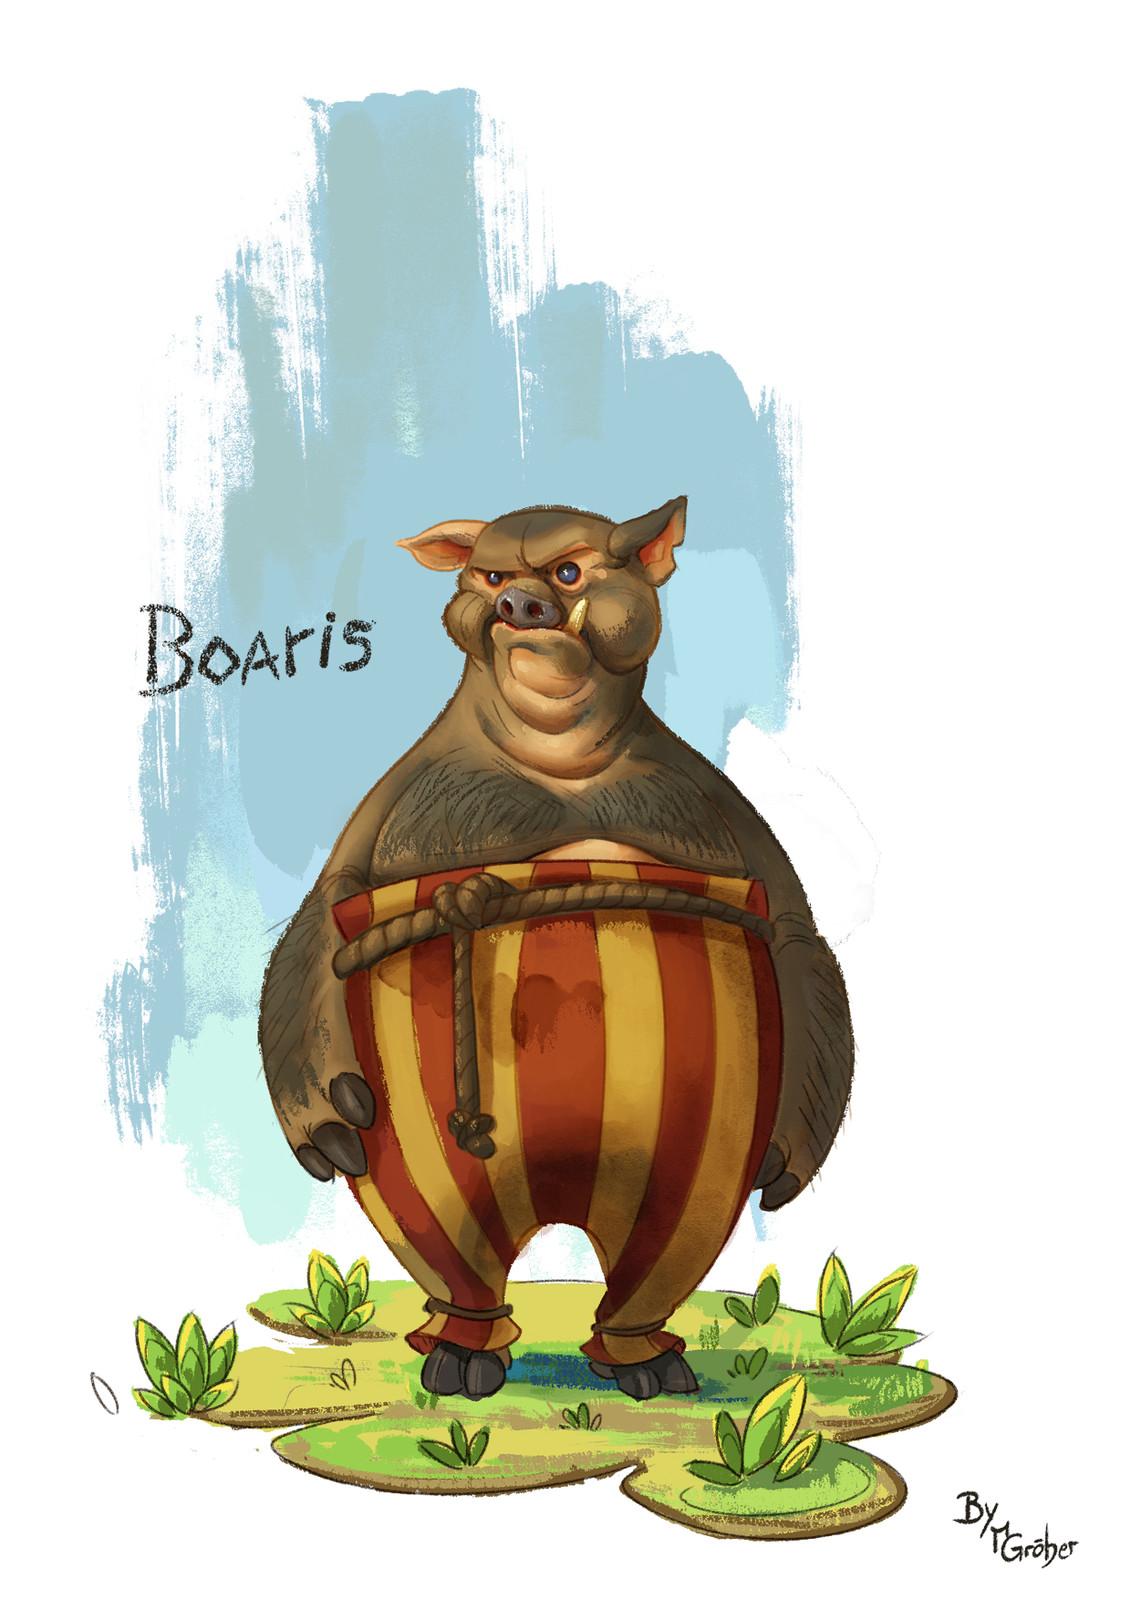 Boaris character painting